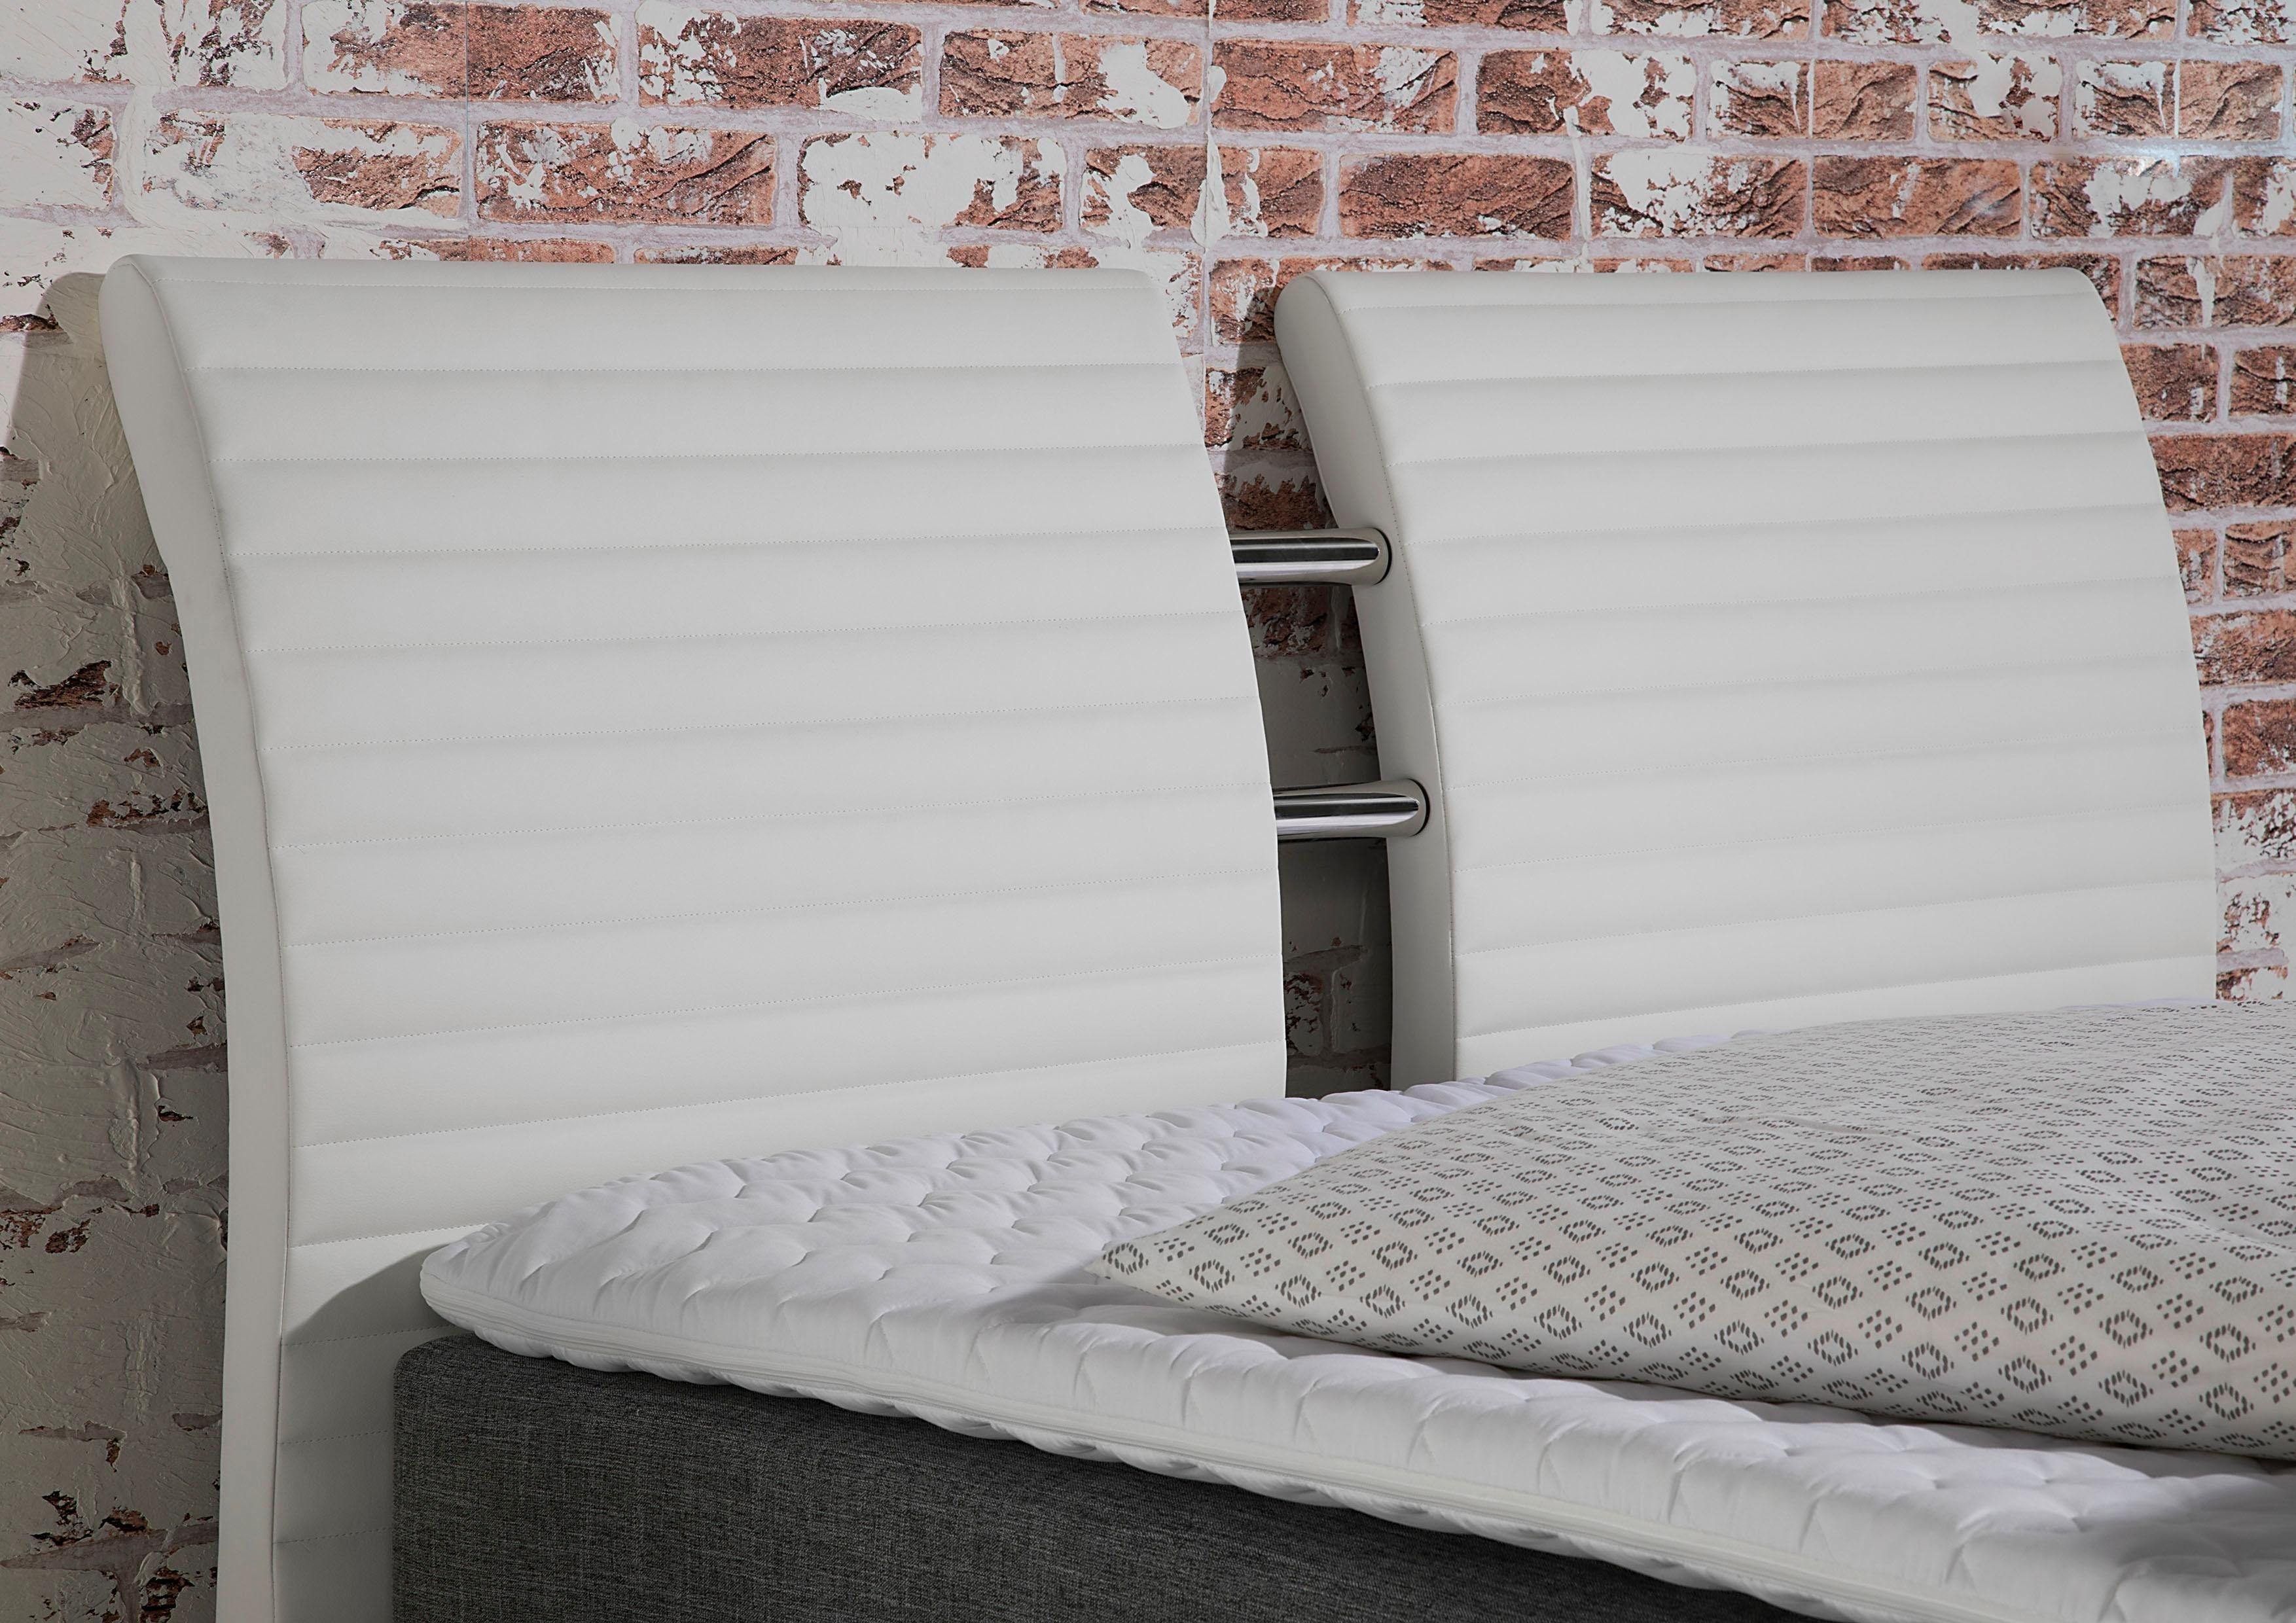 Doppelbett Weiß 140x200 Bett 120x200 Mit Bettkasten Bettgestell 160x200 Ohne Kopfteil Metallbett 200x200 Bett 200x200 Sel Boxspringbett Bett Ideen Bett